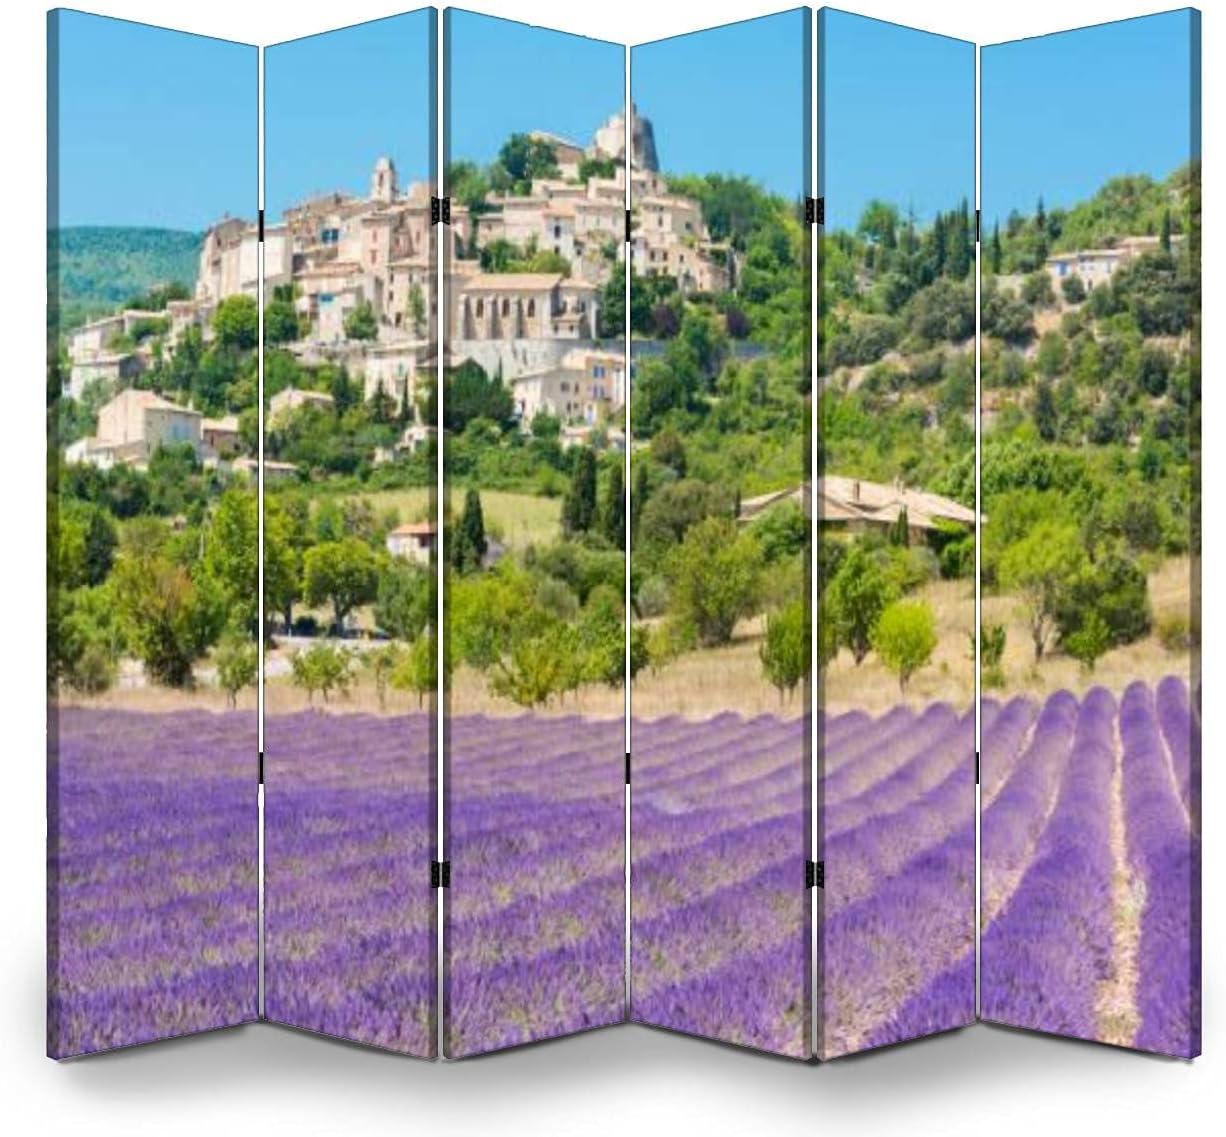 Dola-Dola 6 Panel Screen Room Rotonde Folding Simiane Bargain sale Divider la Low price